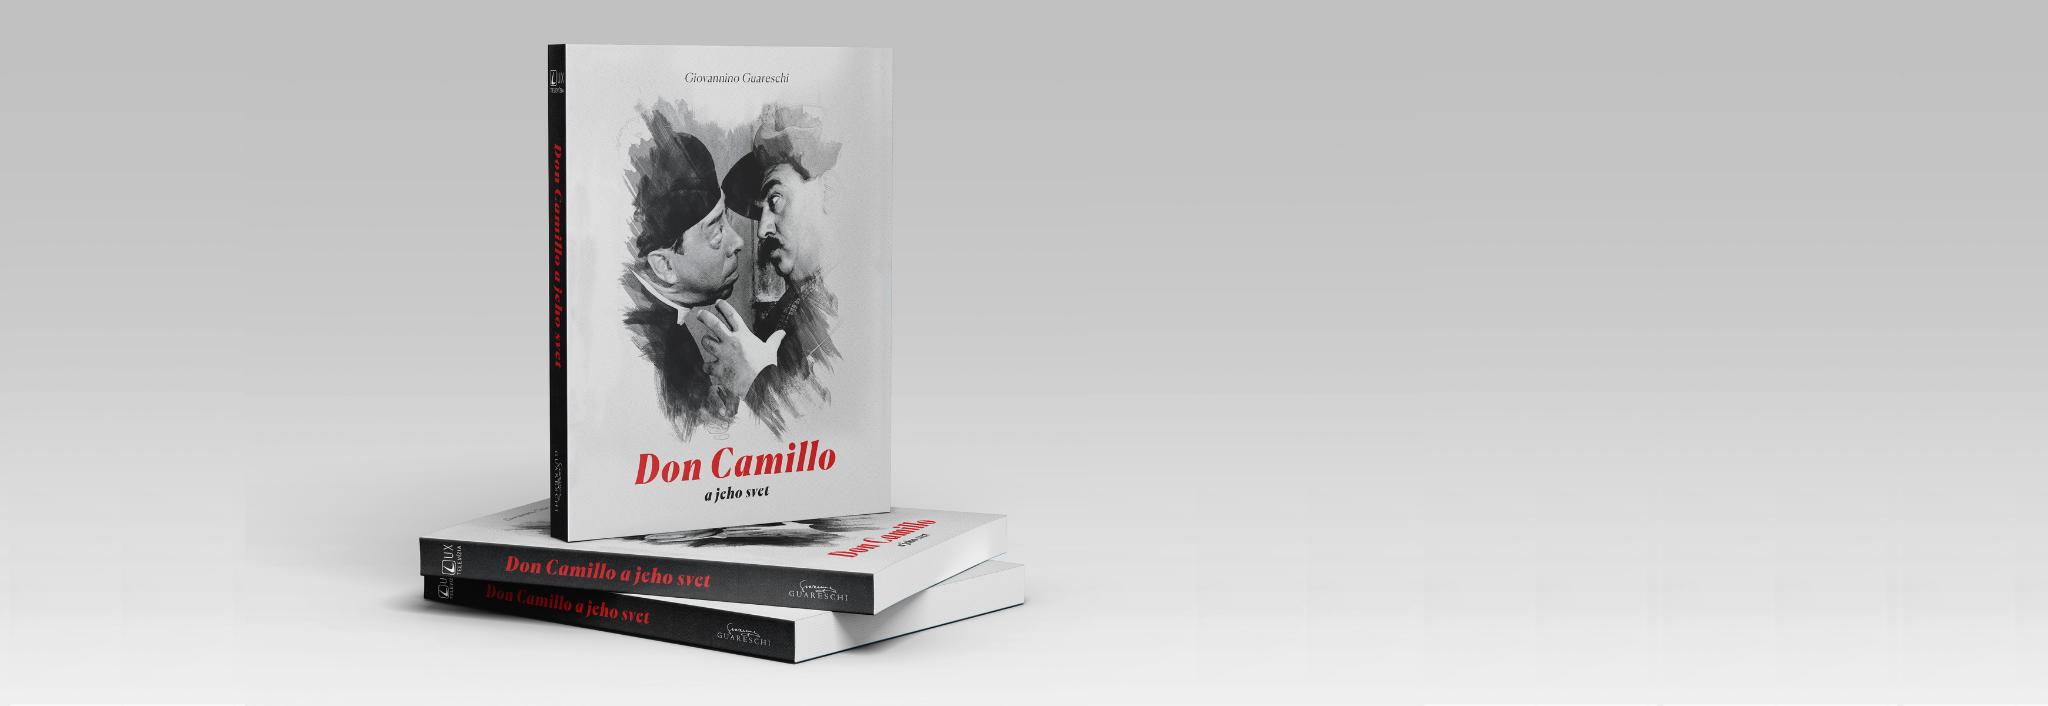 Kniha Don Camillo